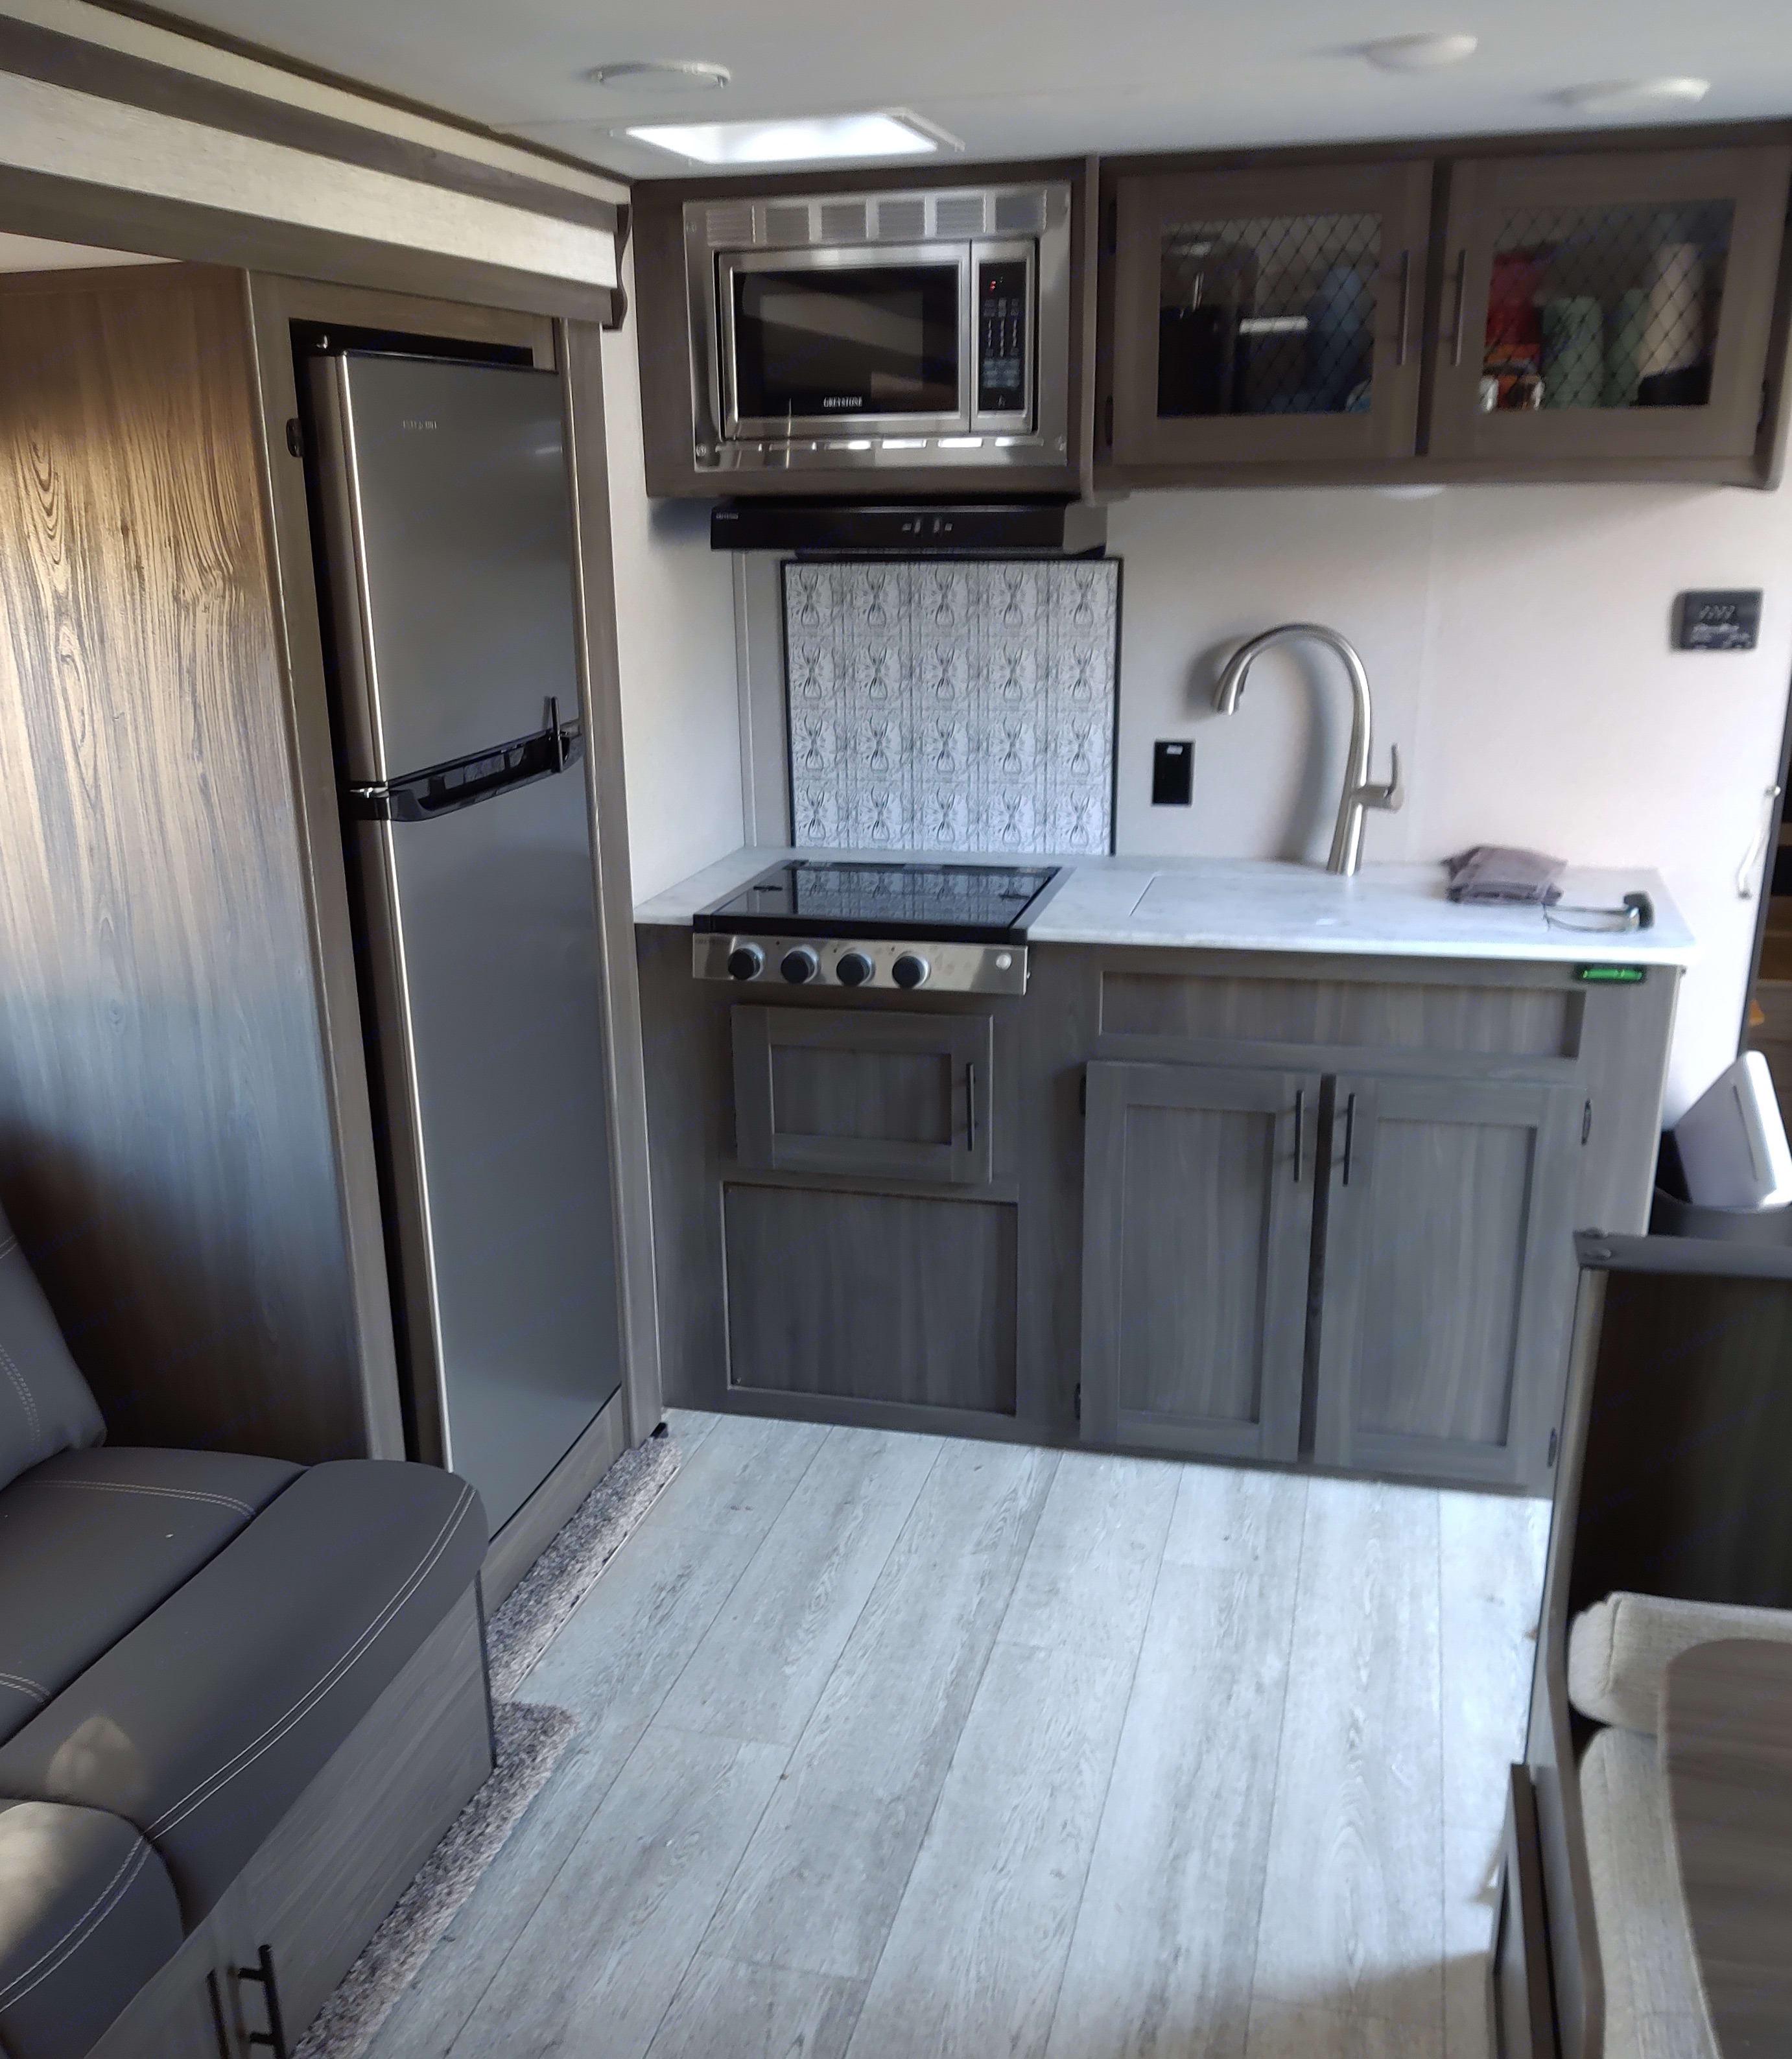 3-burner stove; microwave; Kuerig coffee machine; sink; large refrigerator. Shasta Oasis 2021